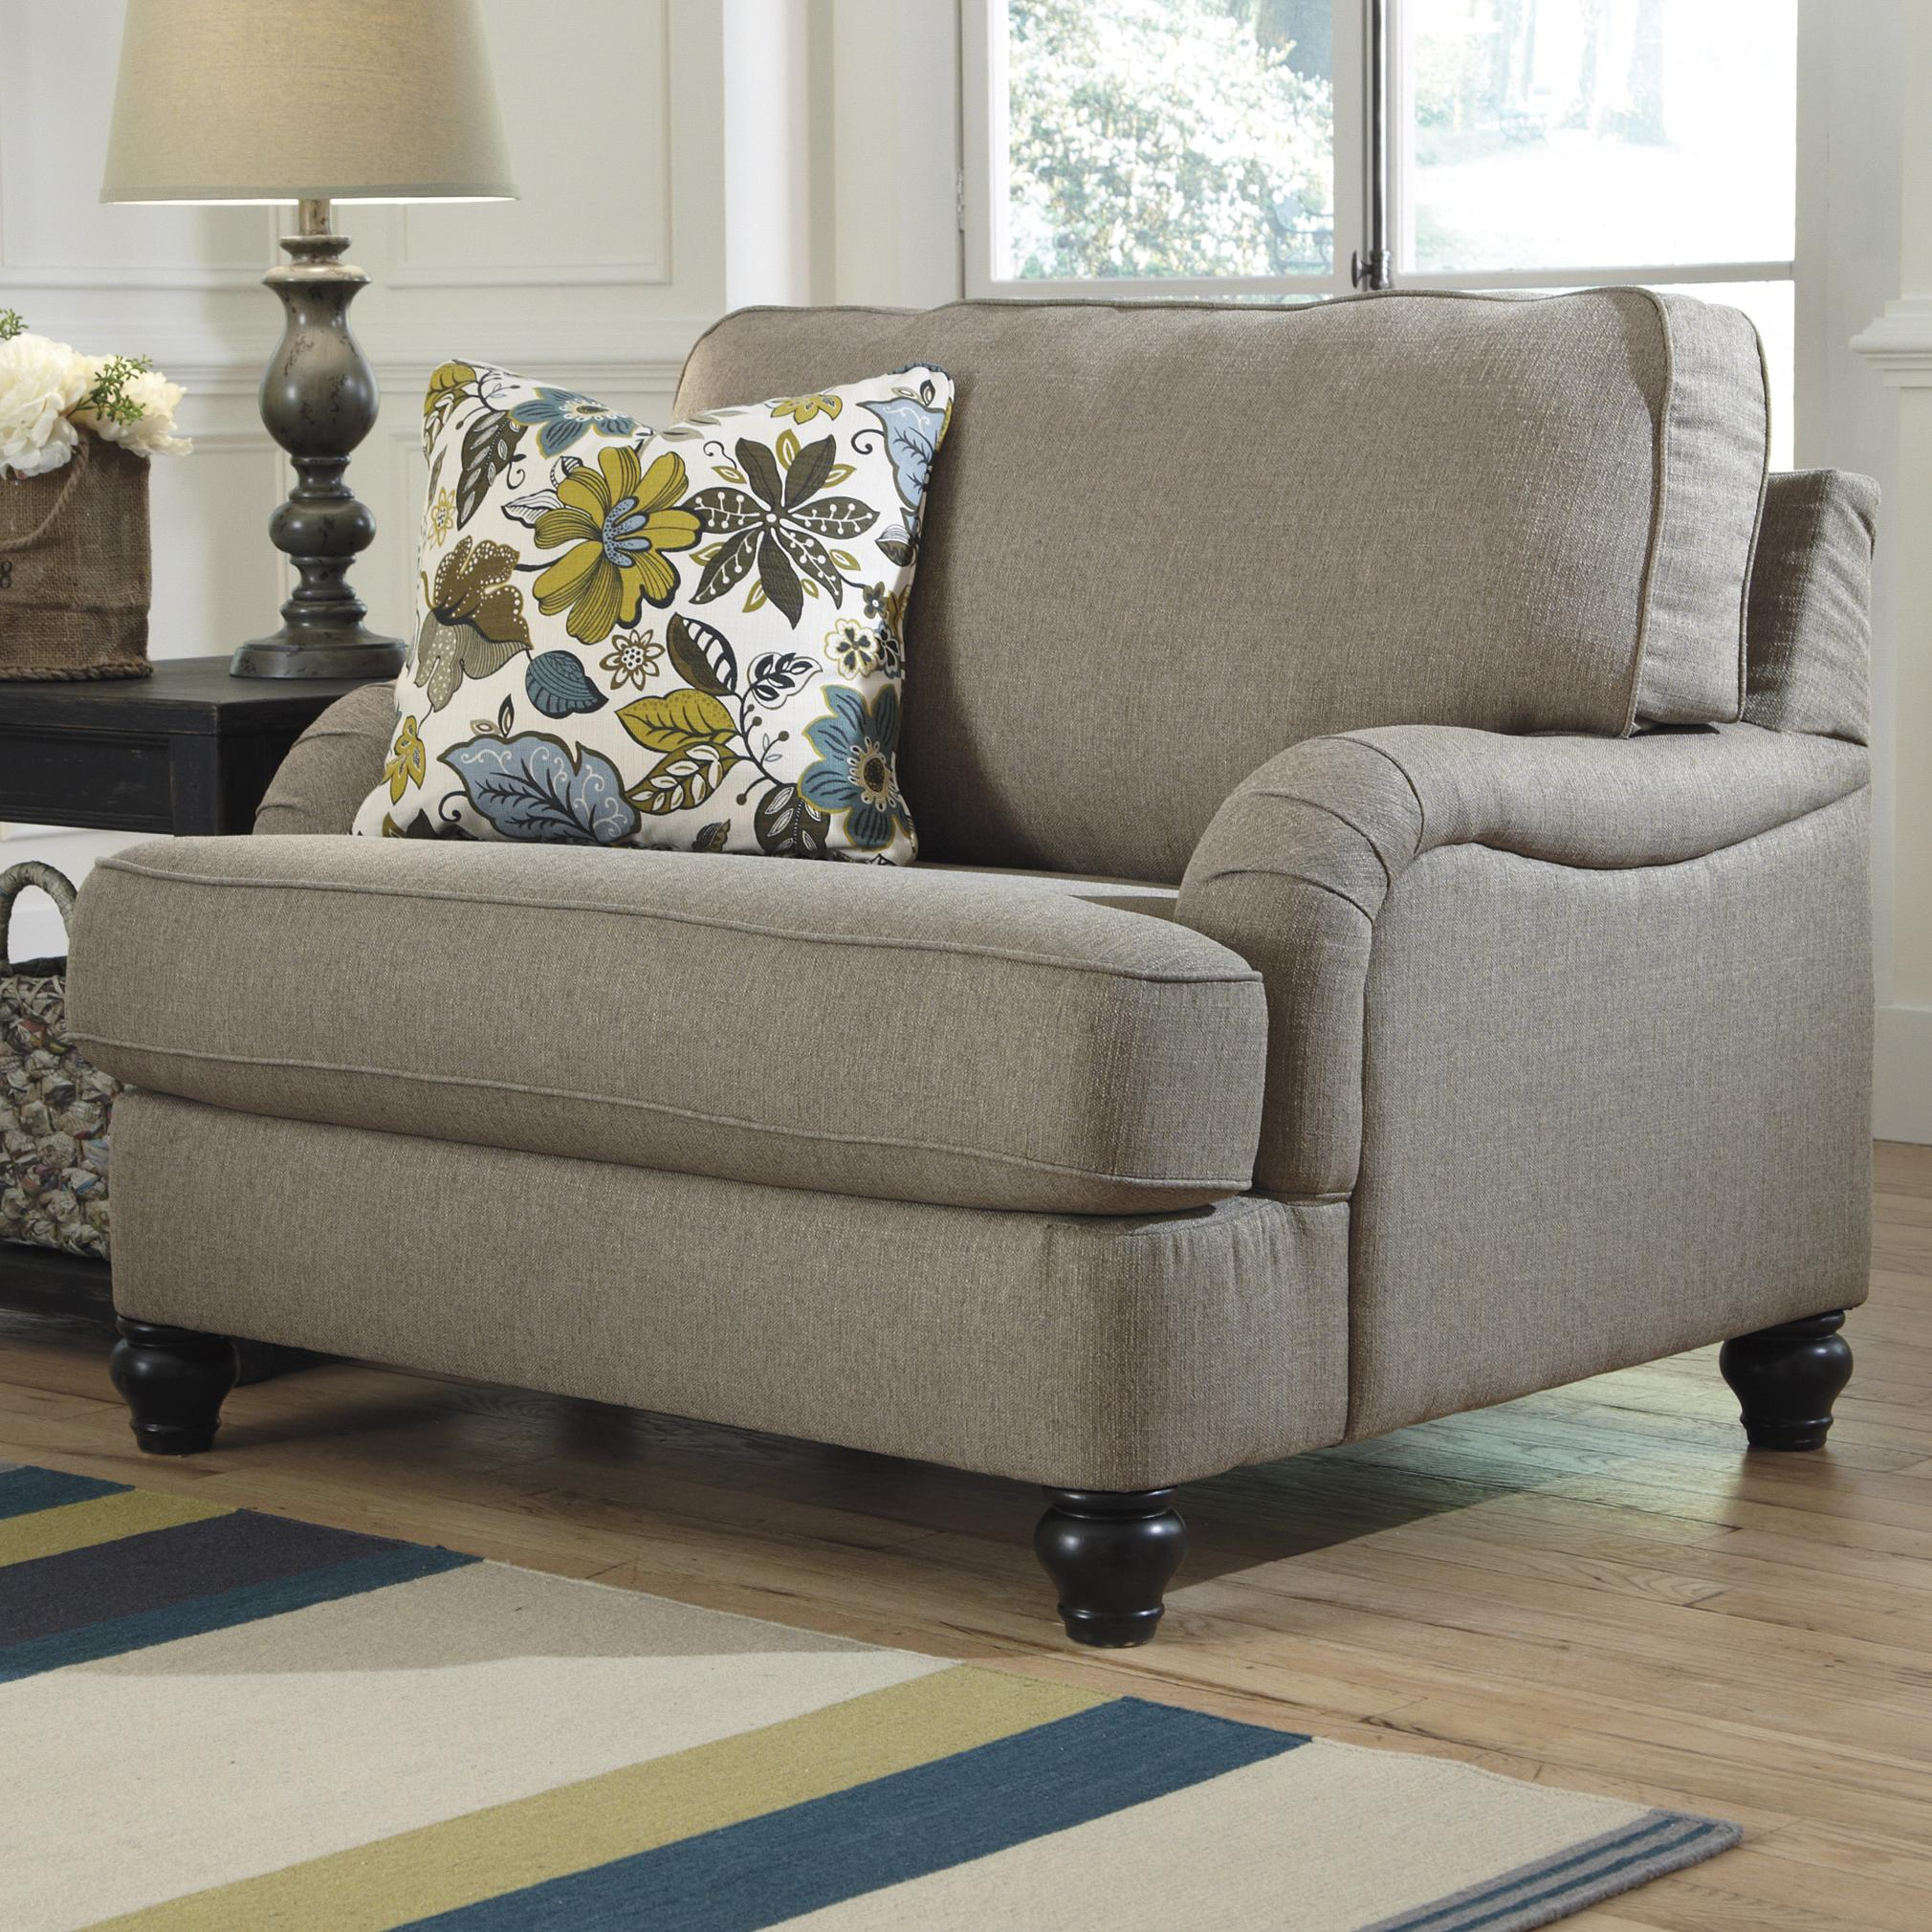 Ashley Furniture Hariston  Shitake Chair and a Half with